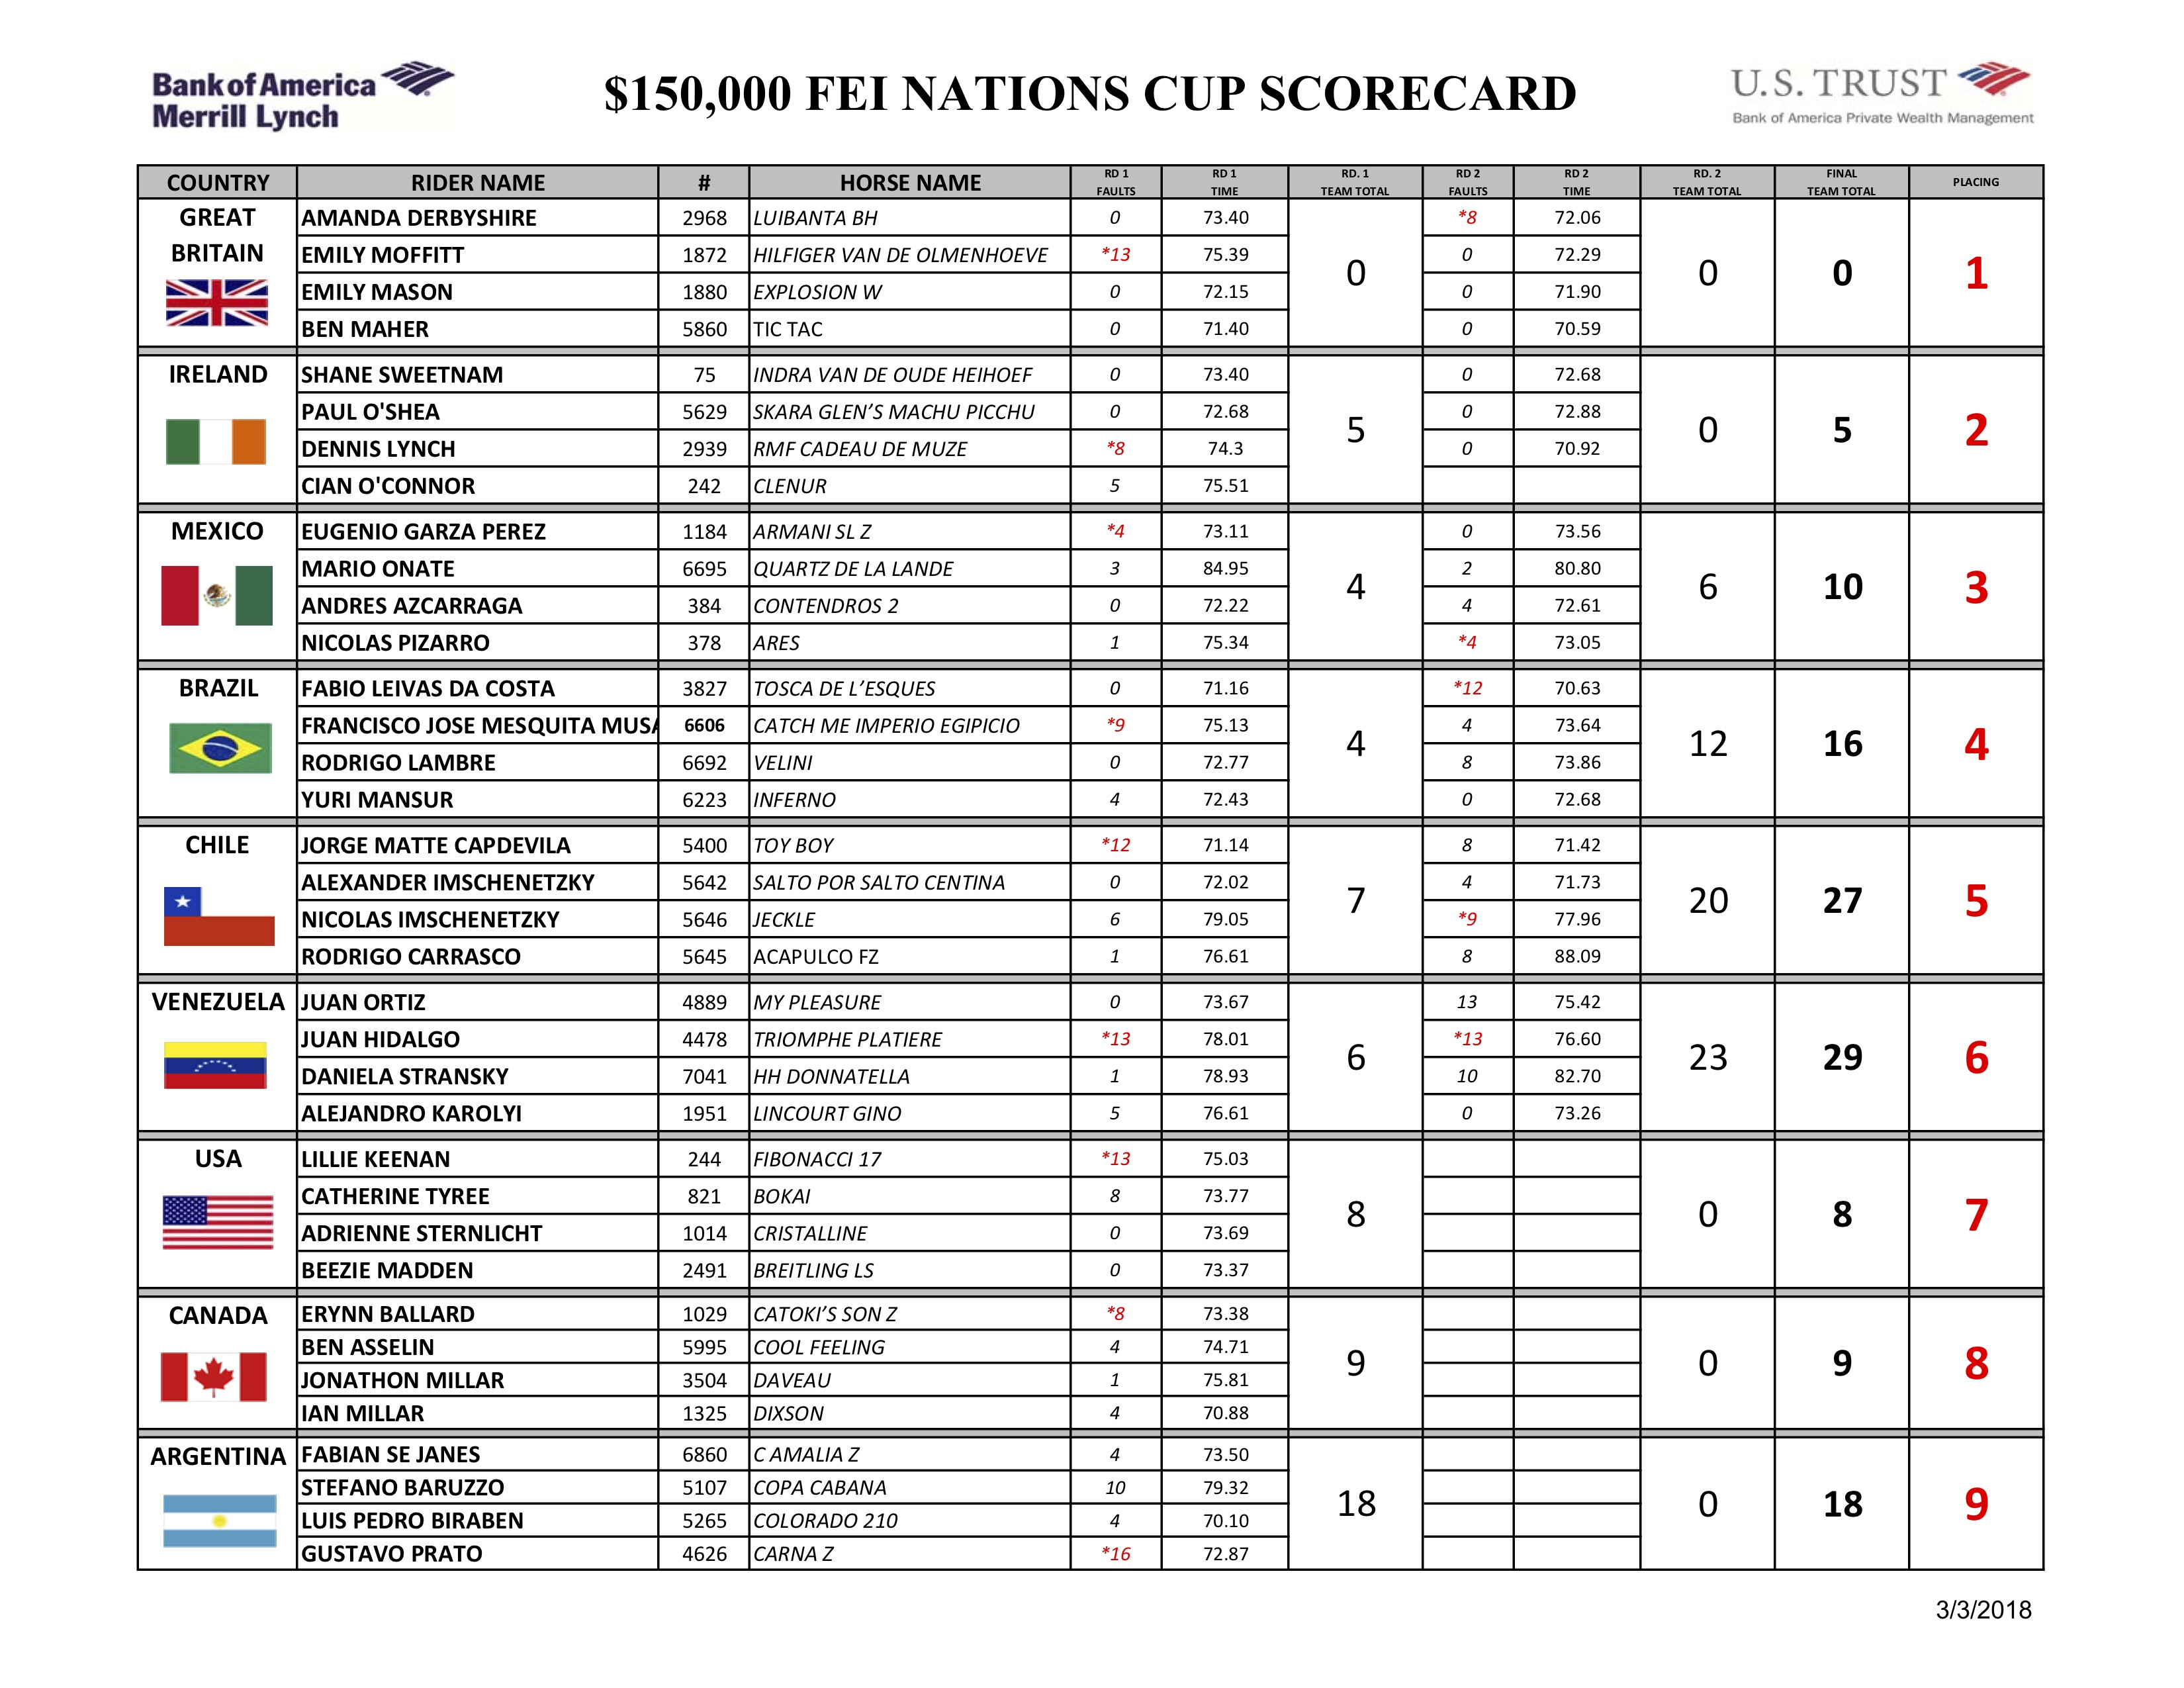 Nations Cup Scorecard 2018